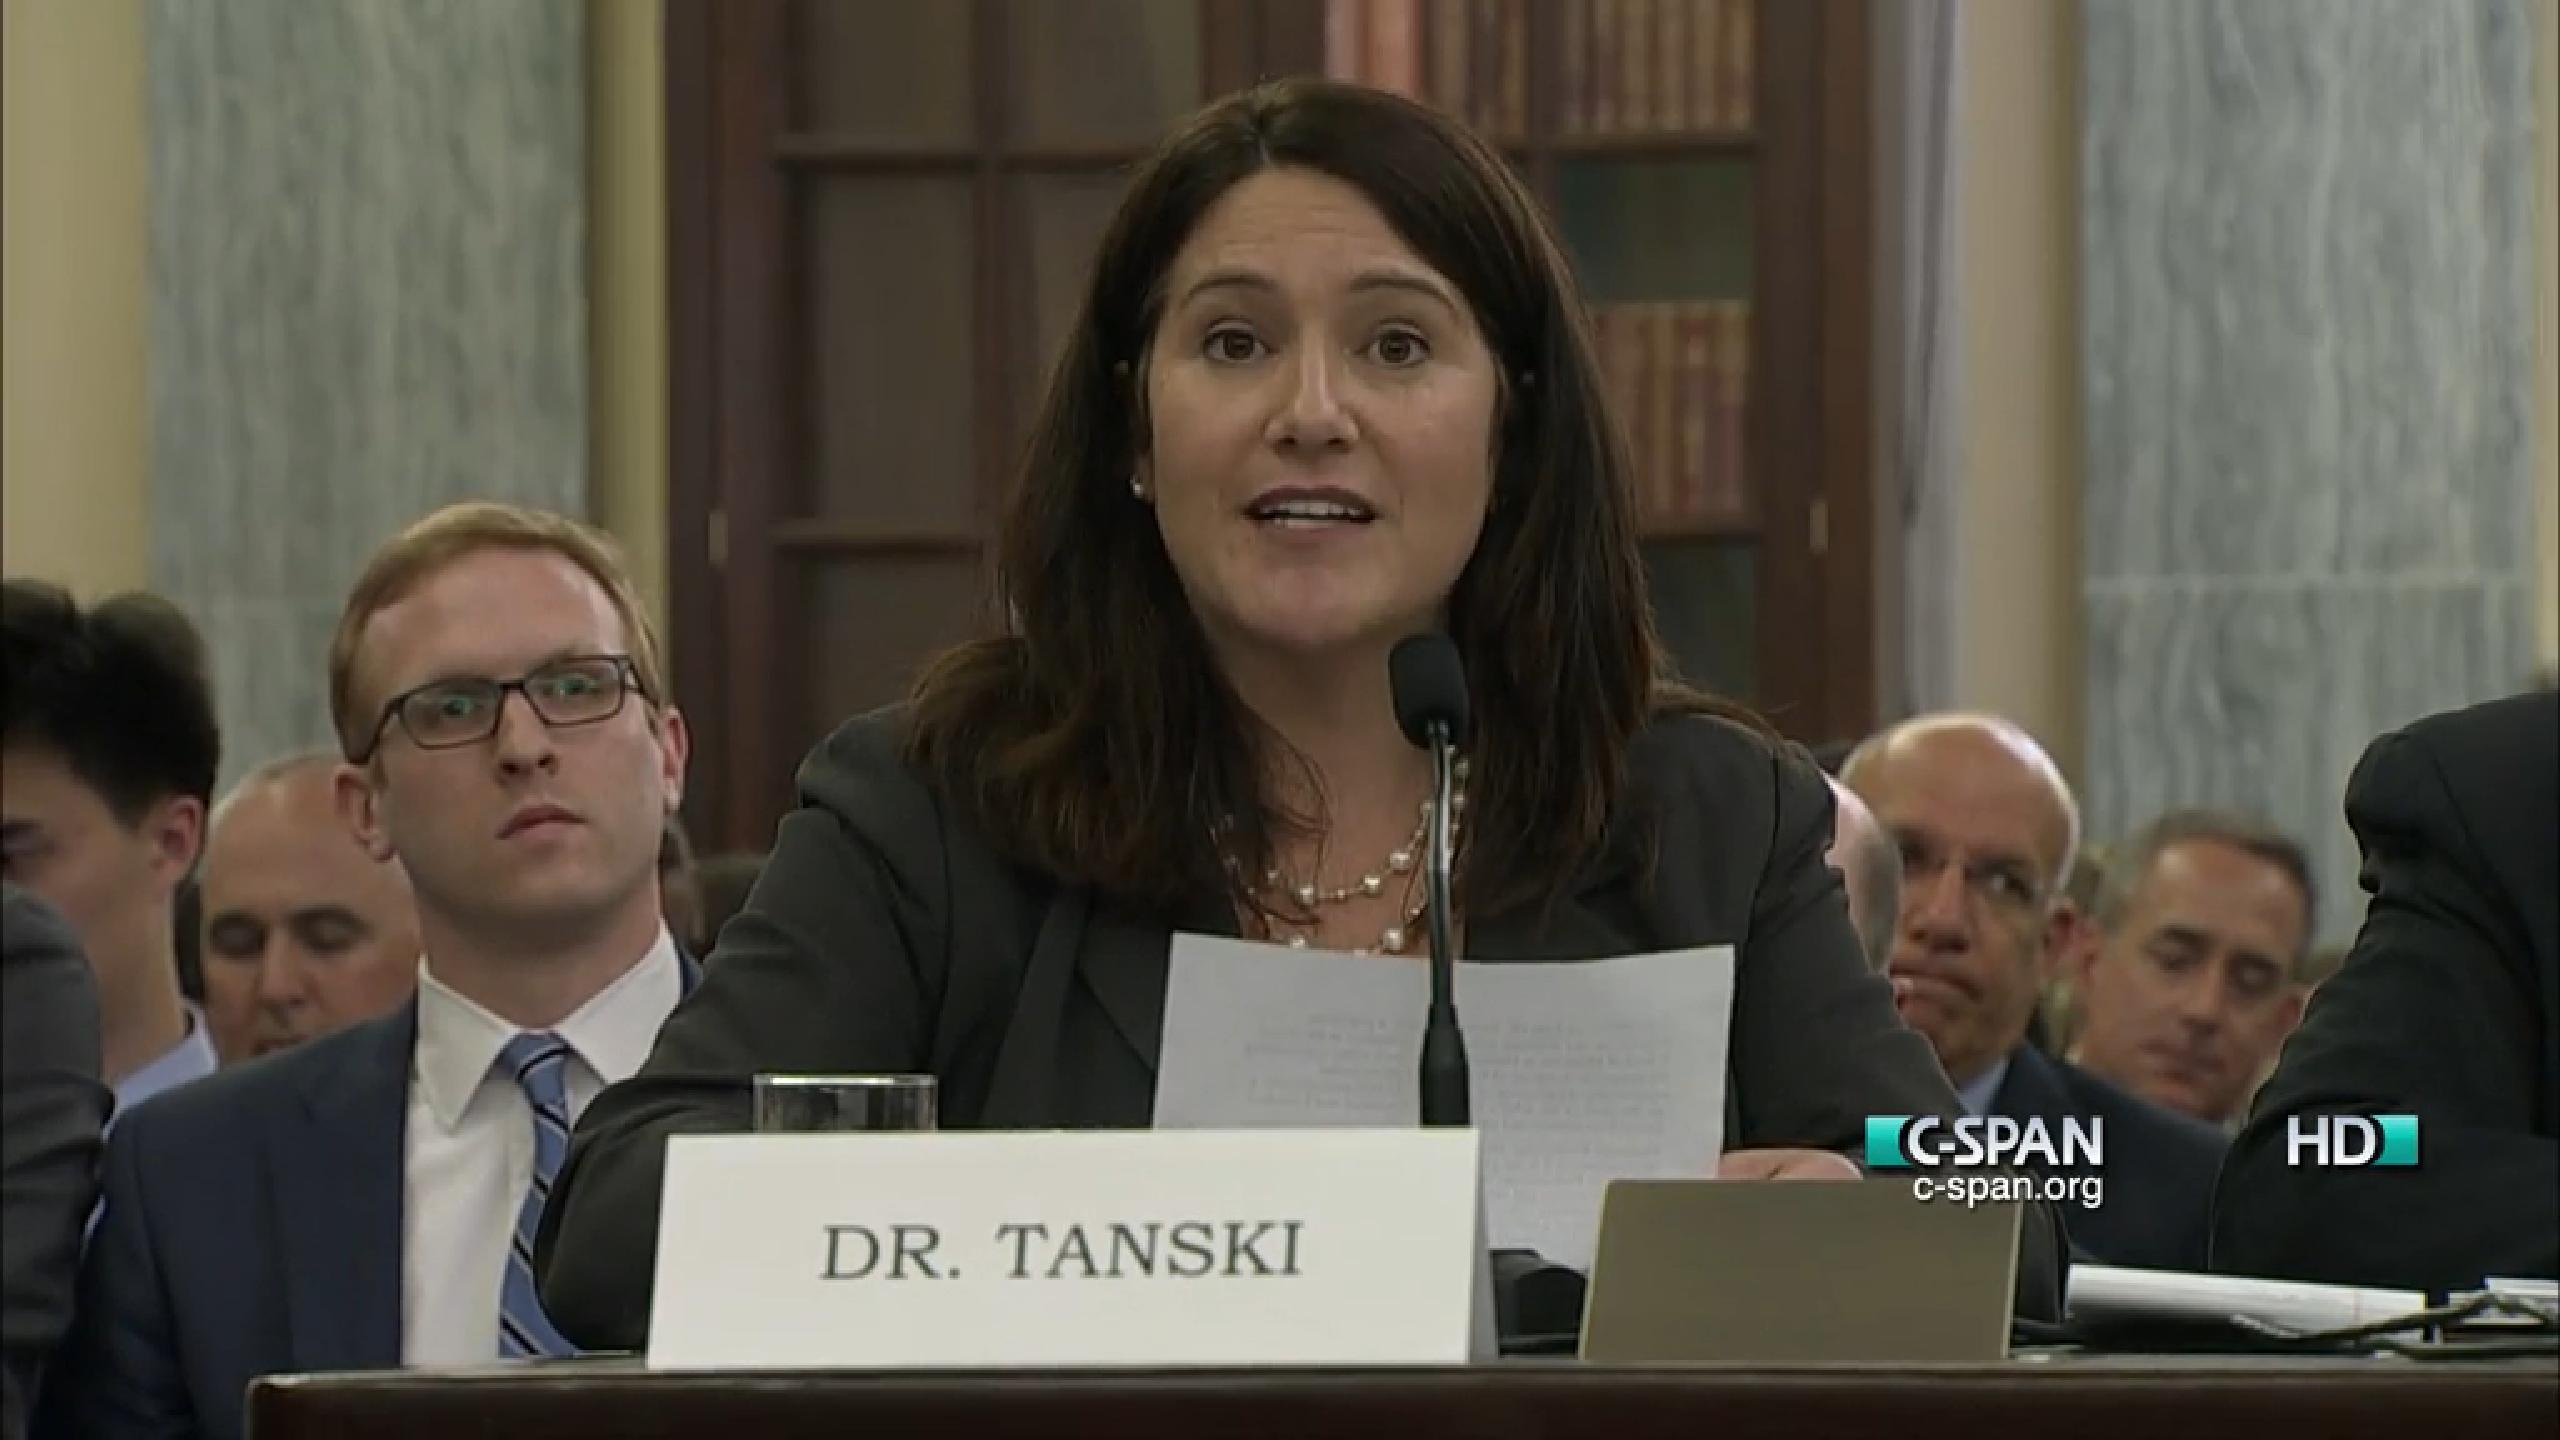 Susanne Tanski on the Risks of E-Cigarettes